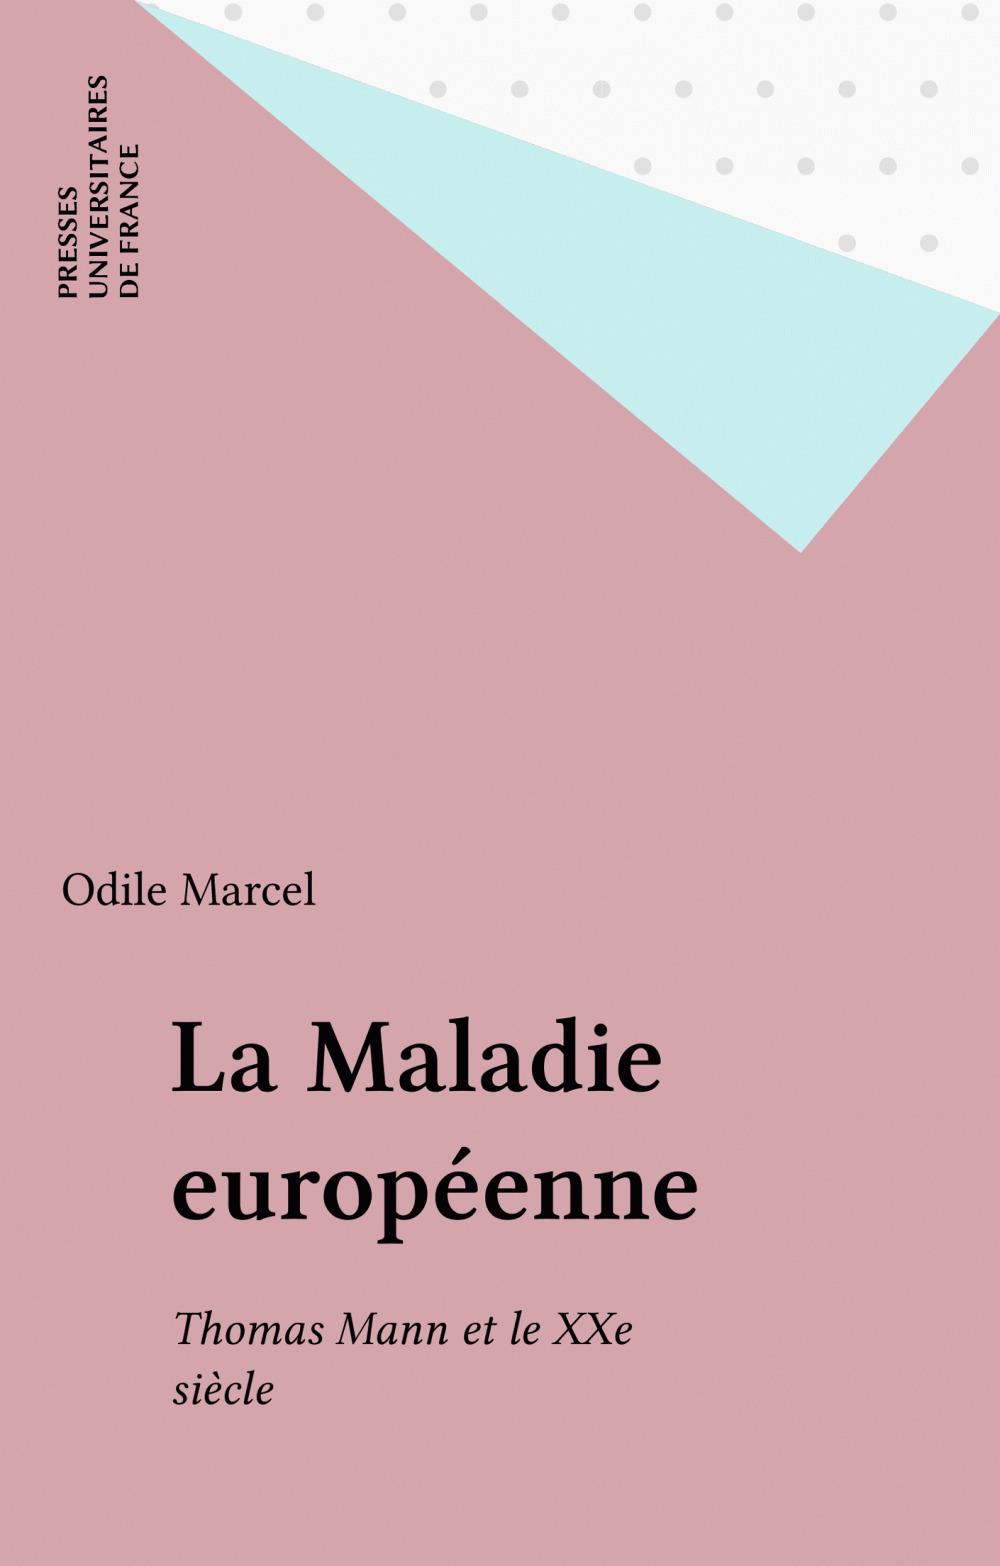 La Maladie européenne